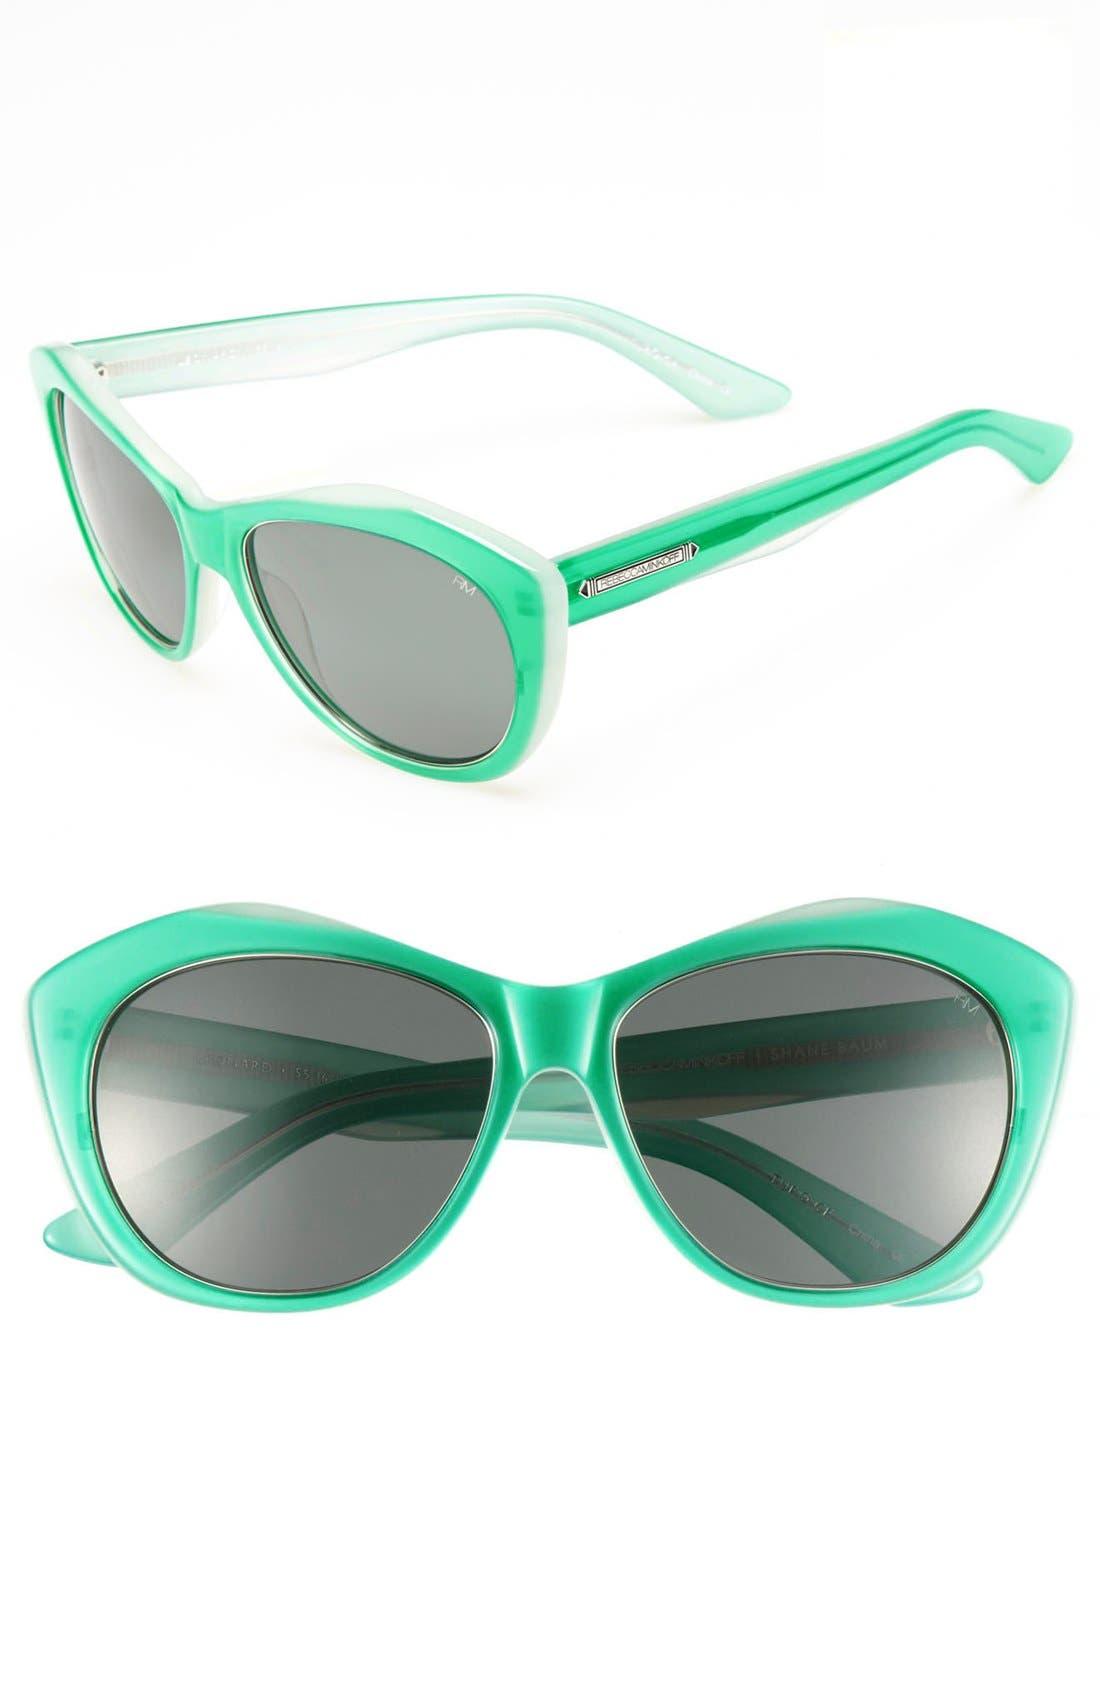 Main Image - Rebecca Minkoff 'Leonard' Sunglasses